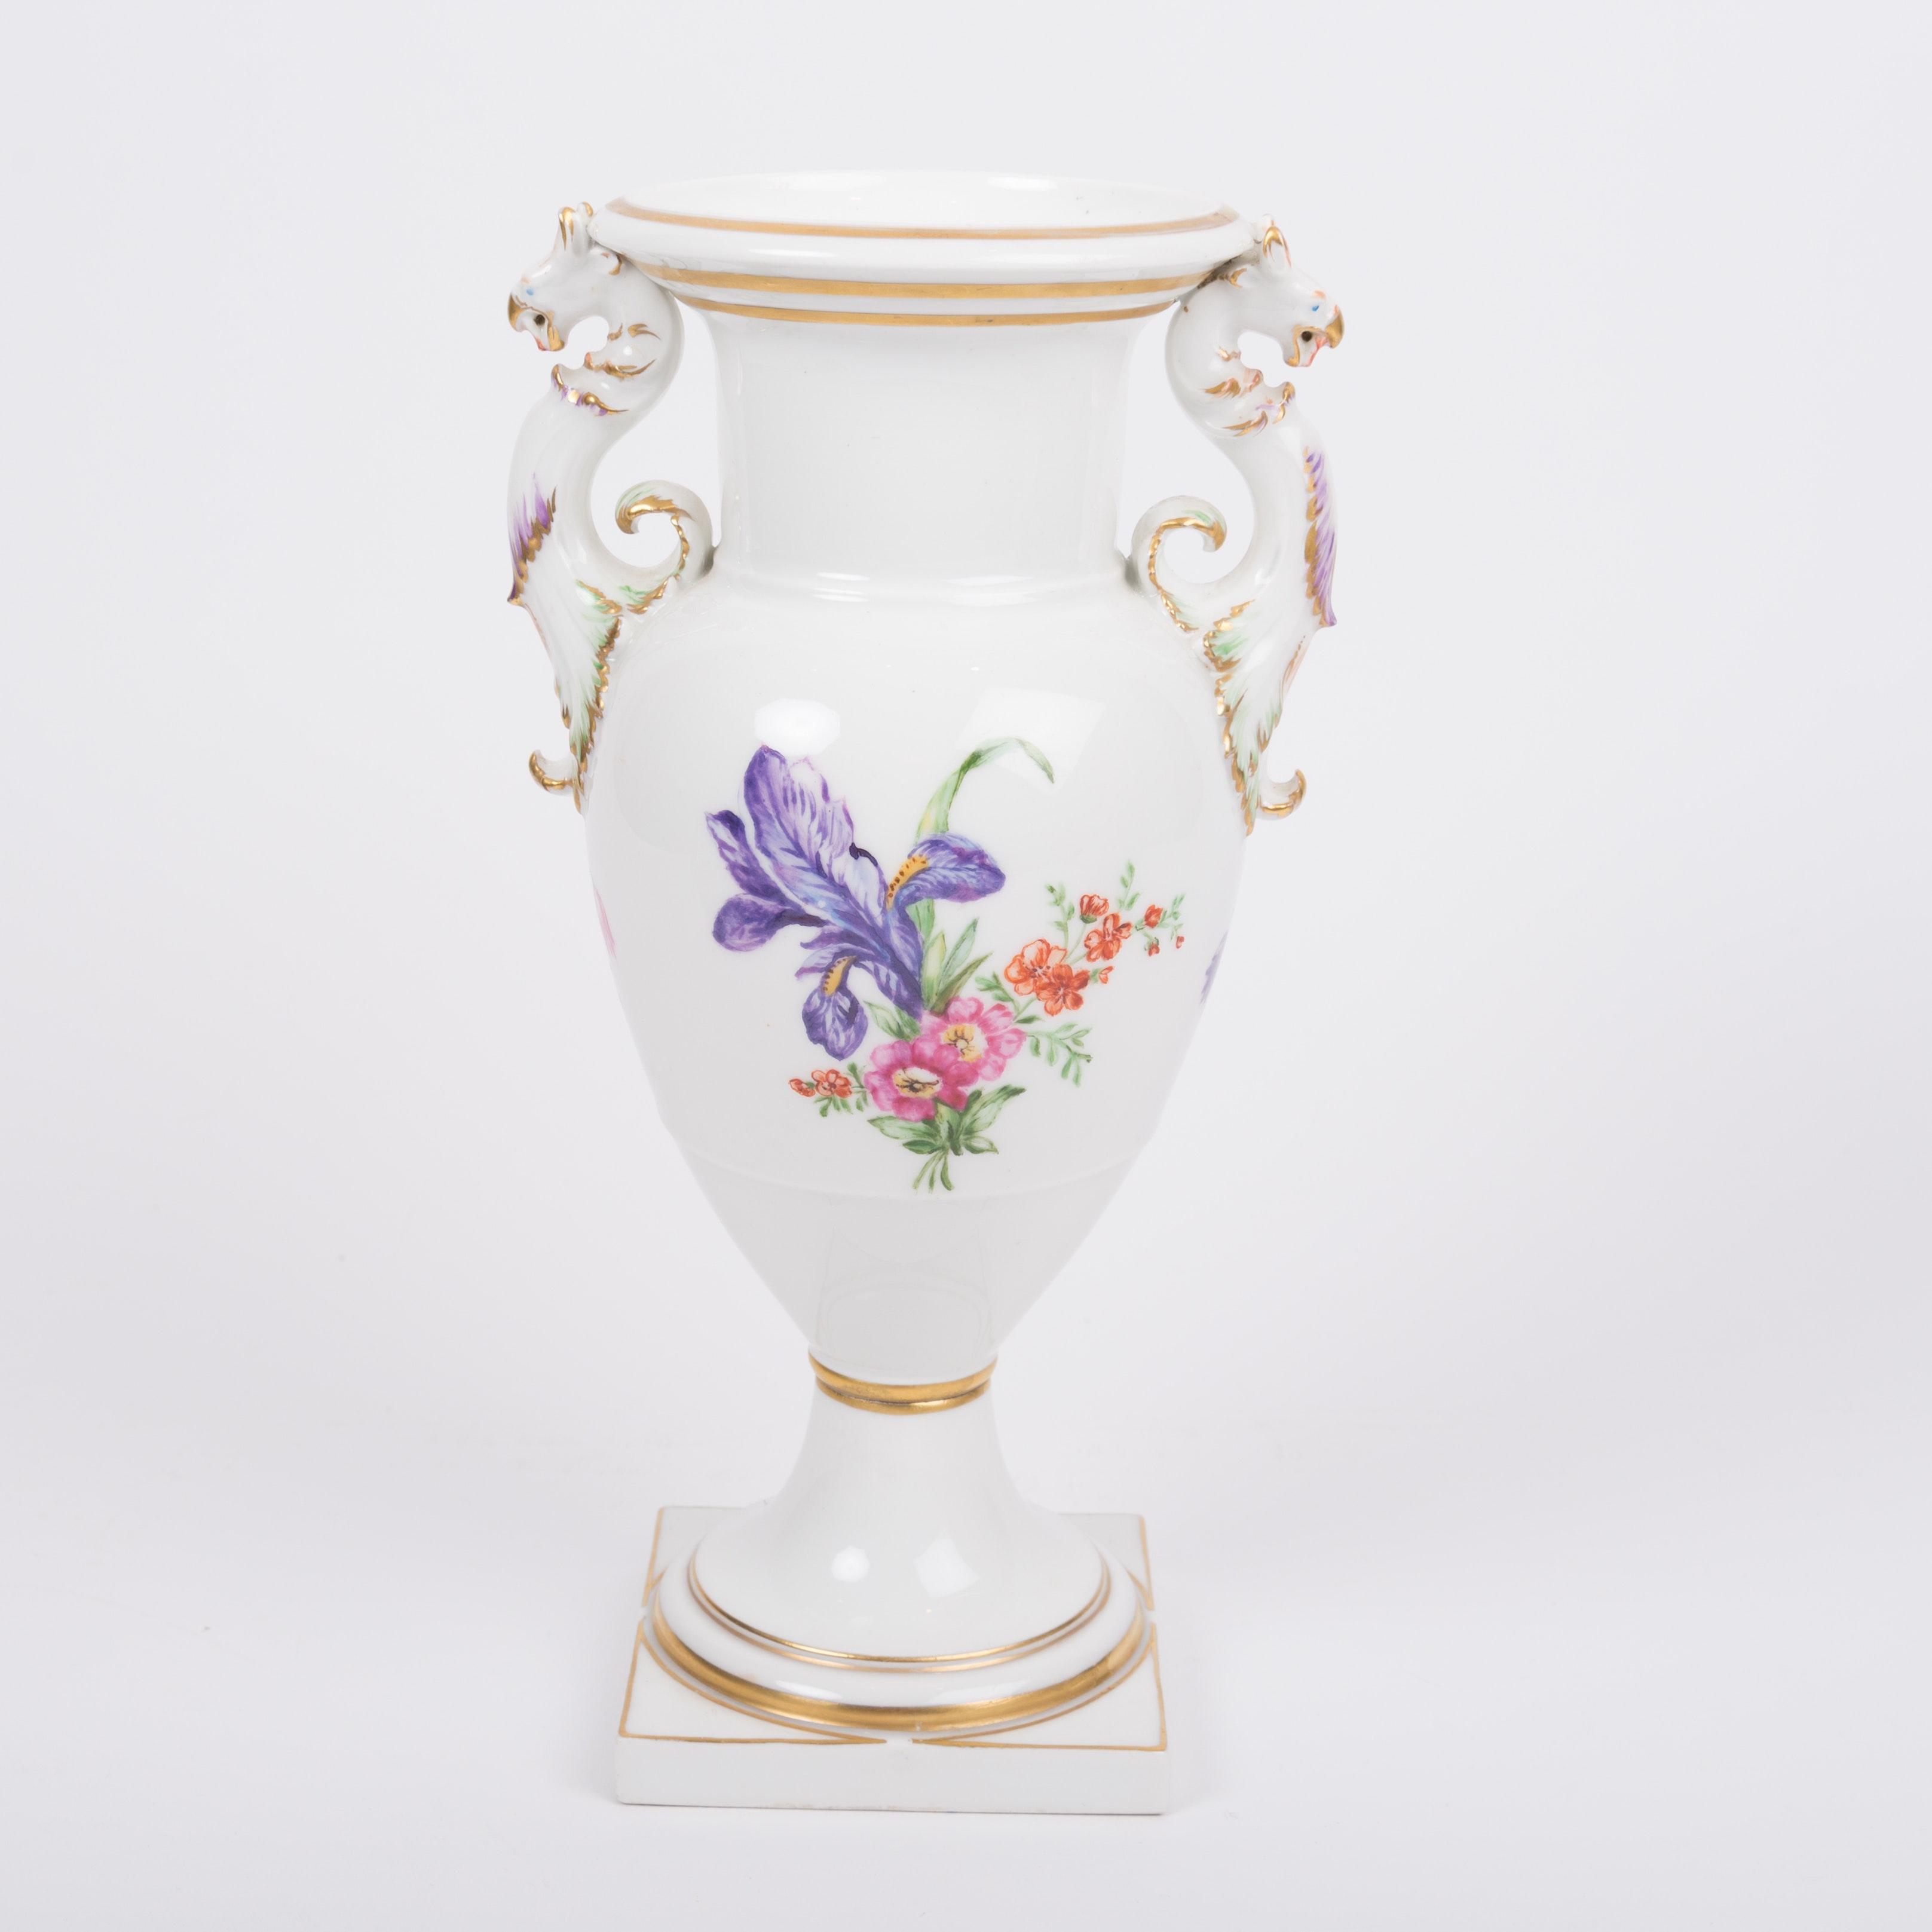 KPM White Porcelain Hand Painted Vase